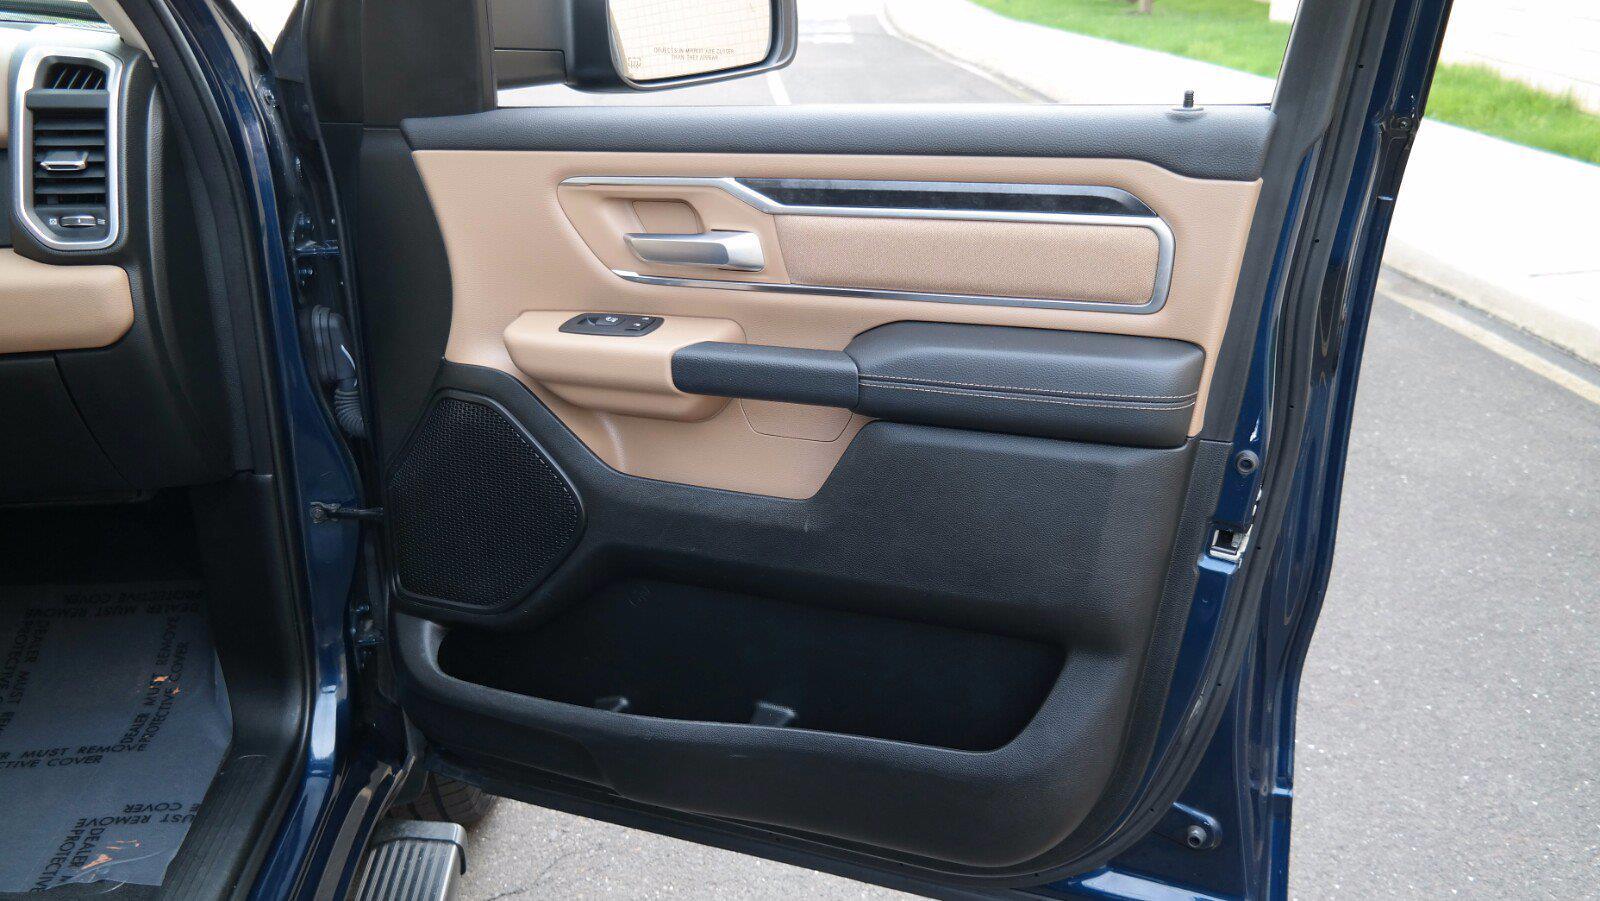 2019 Ram 1500 Quad Cab 4x4, Pickup #FL101401 - photo 18